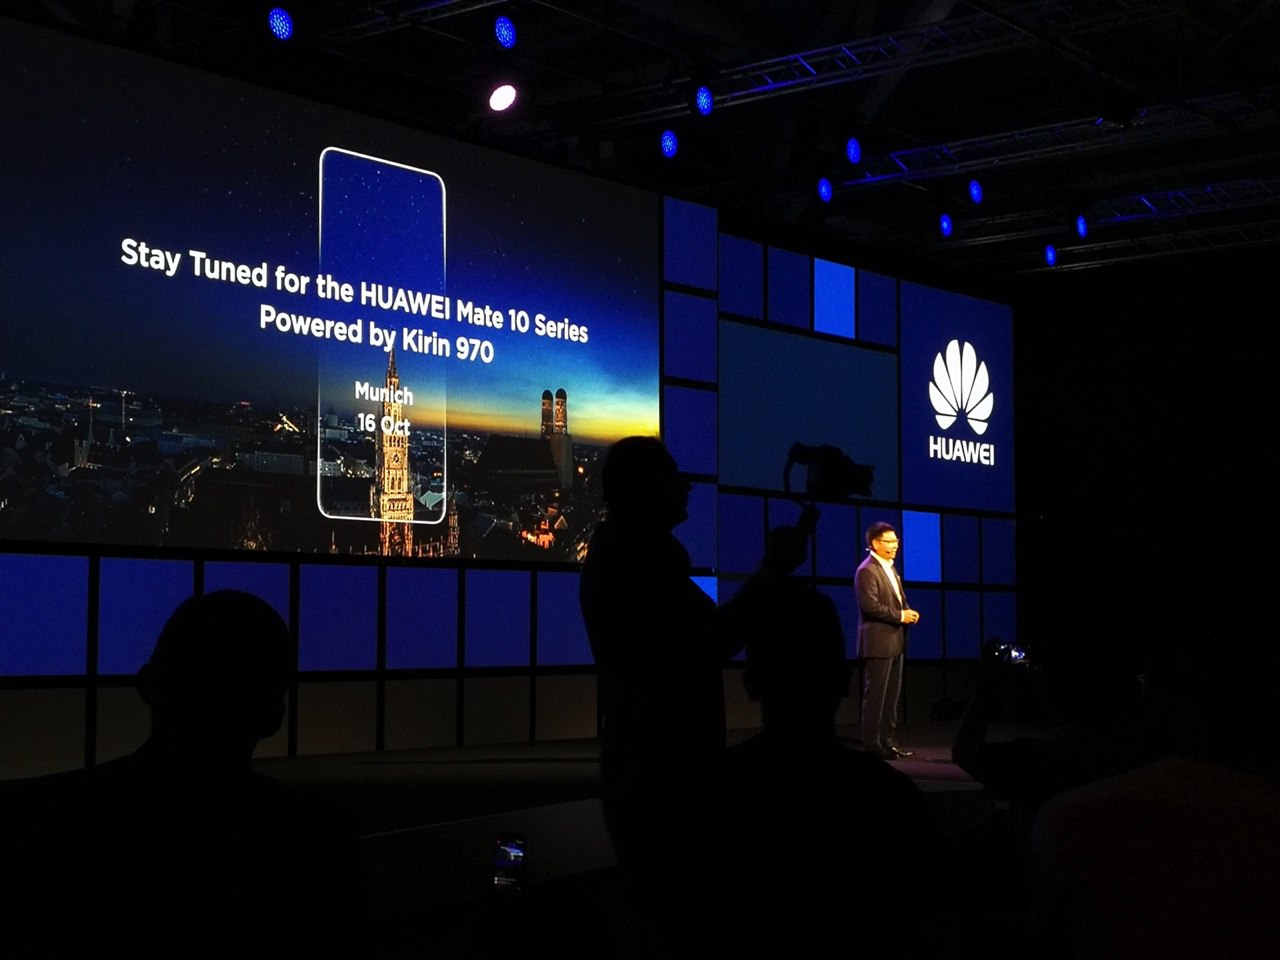 Huawei Mate 10 1 icon